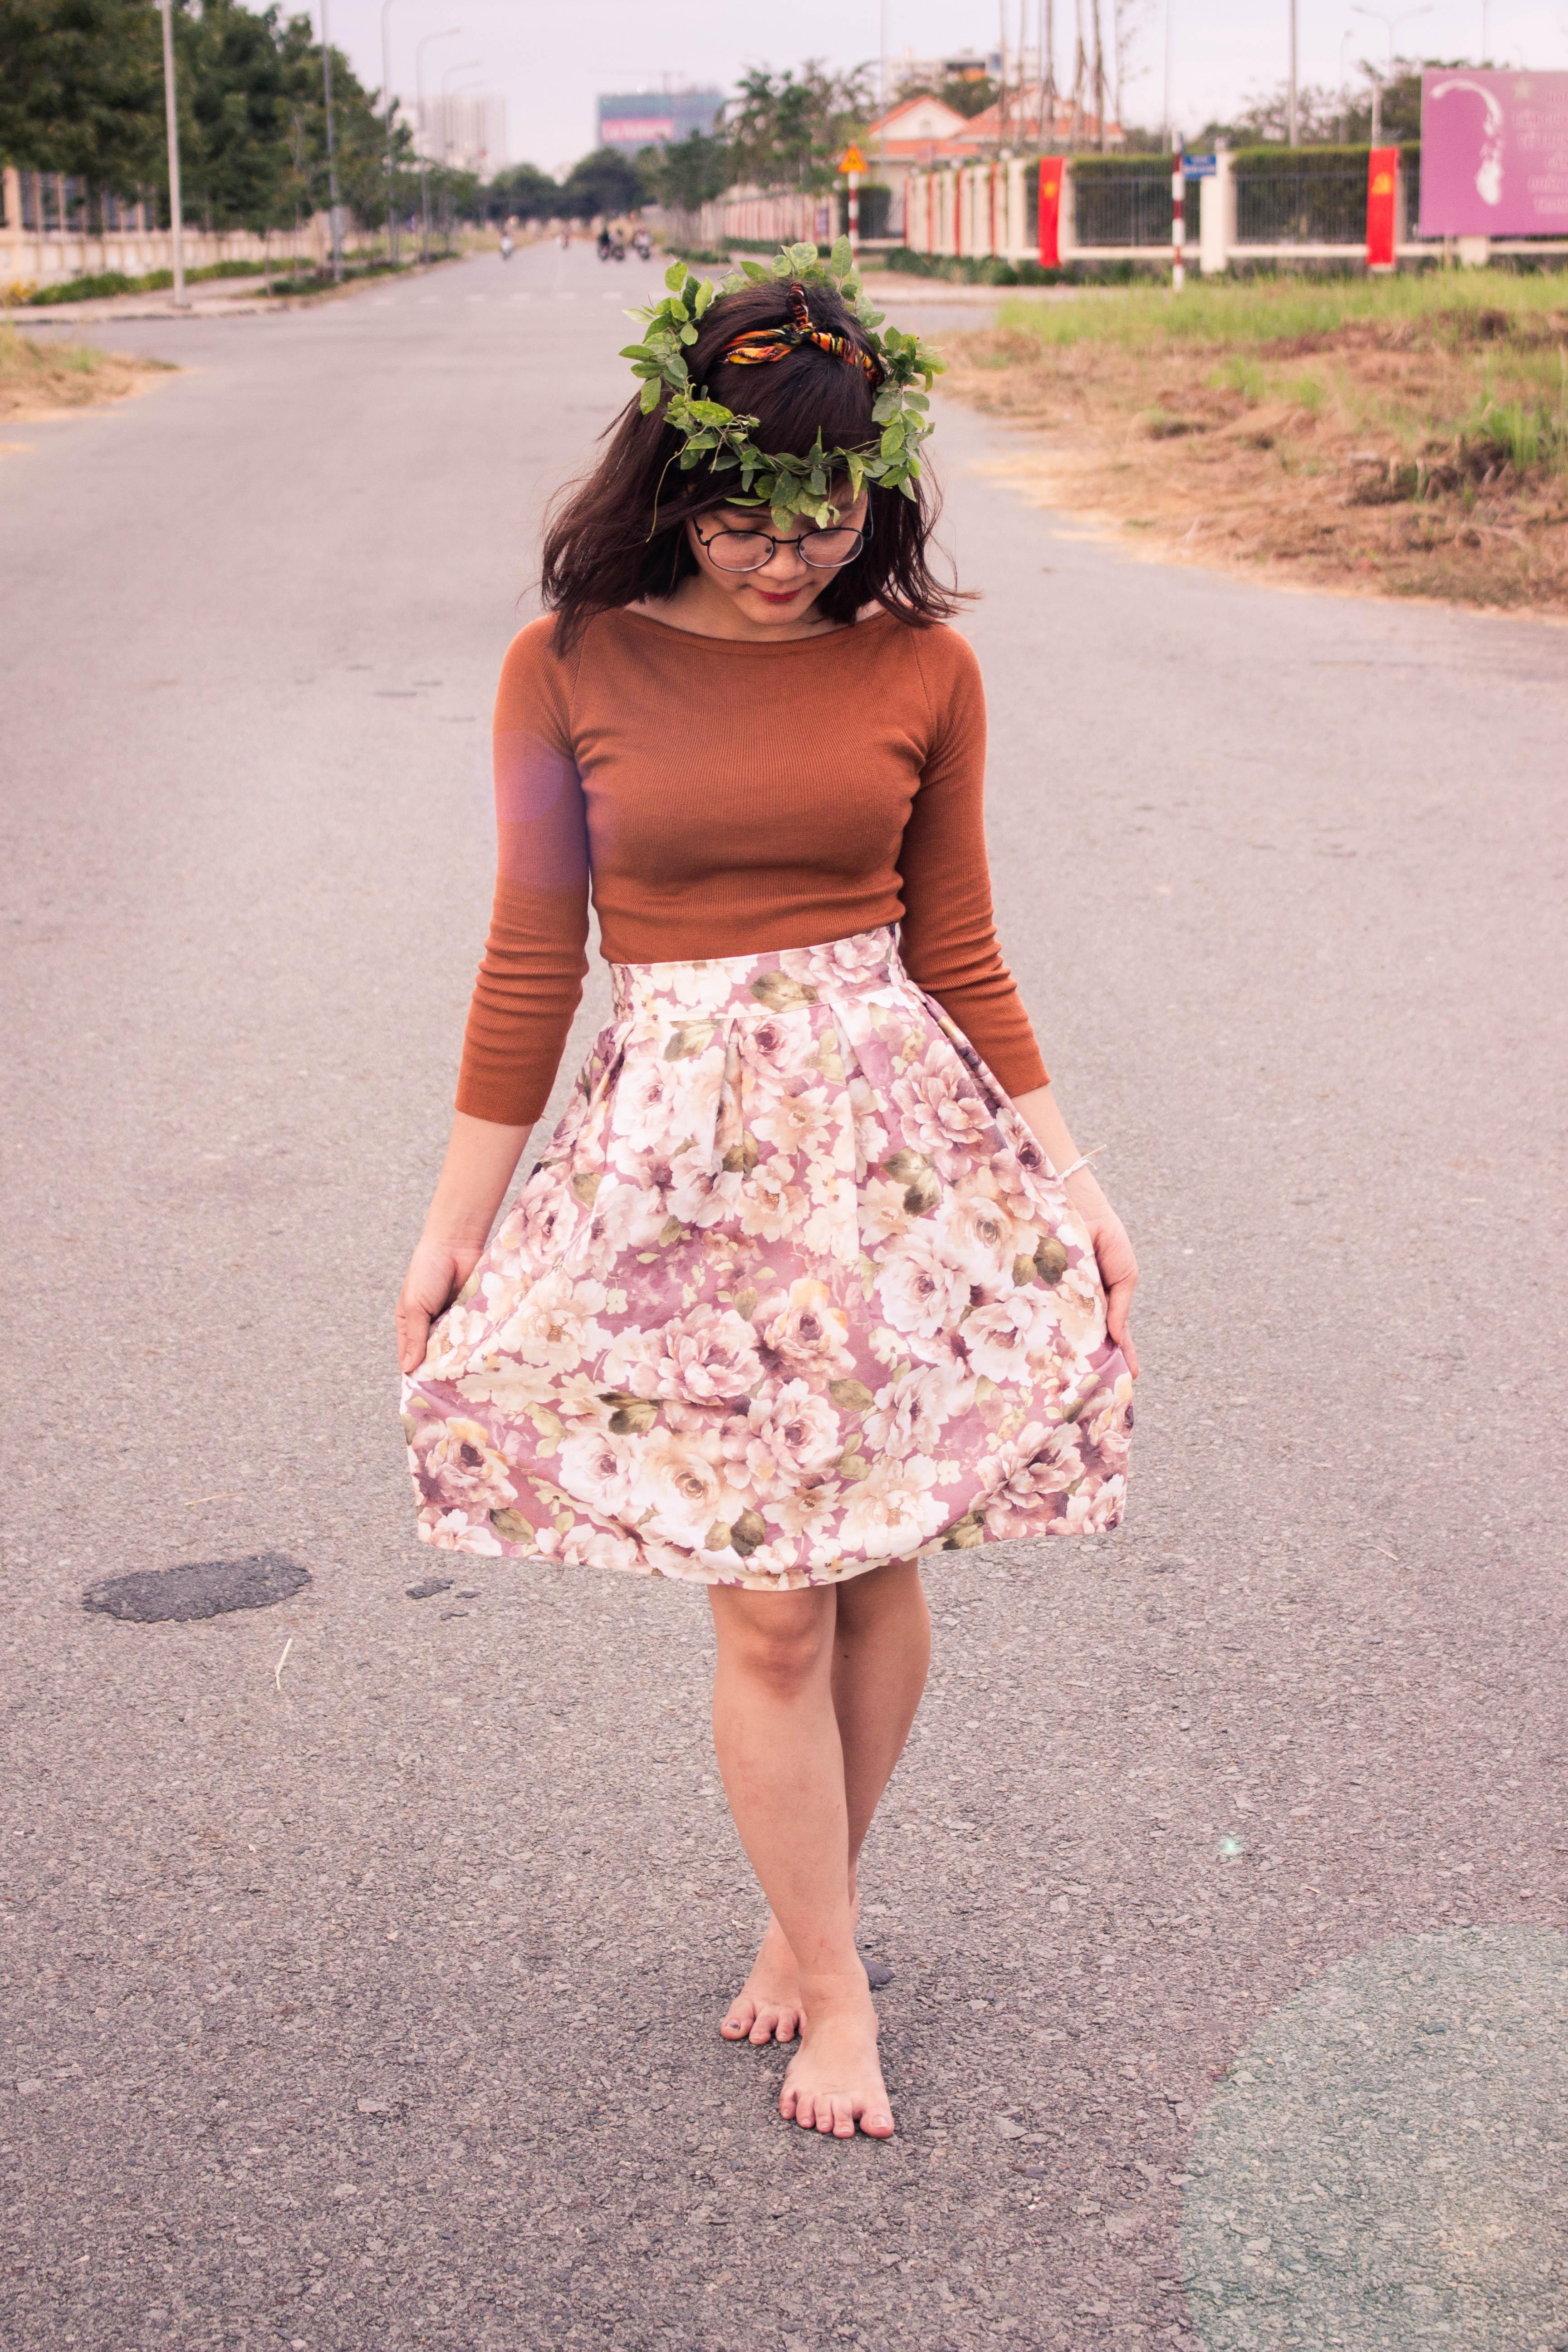 Fotos gratis : niña, mujer, pierna, patrón, modelo, primavera, rojo ...